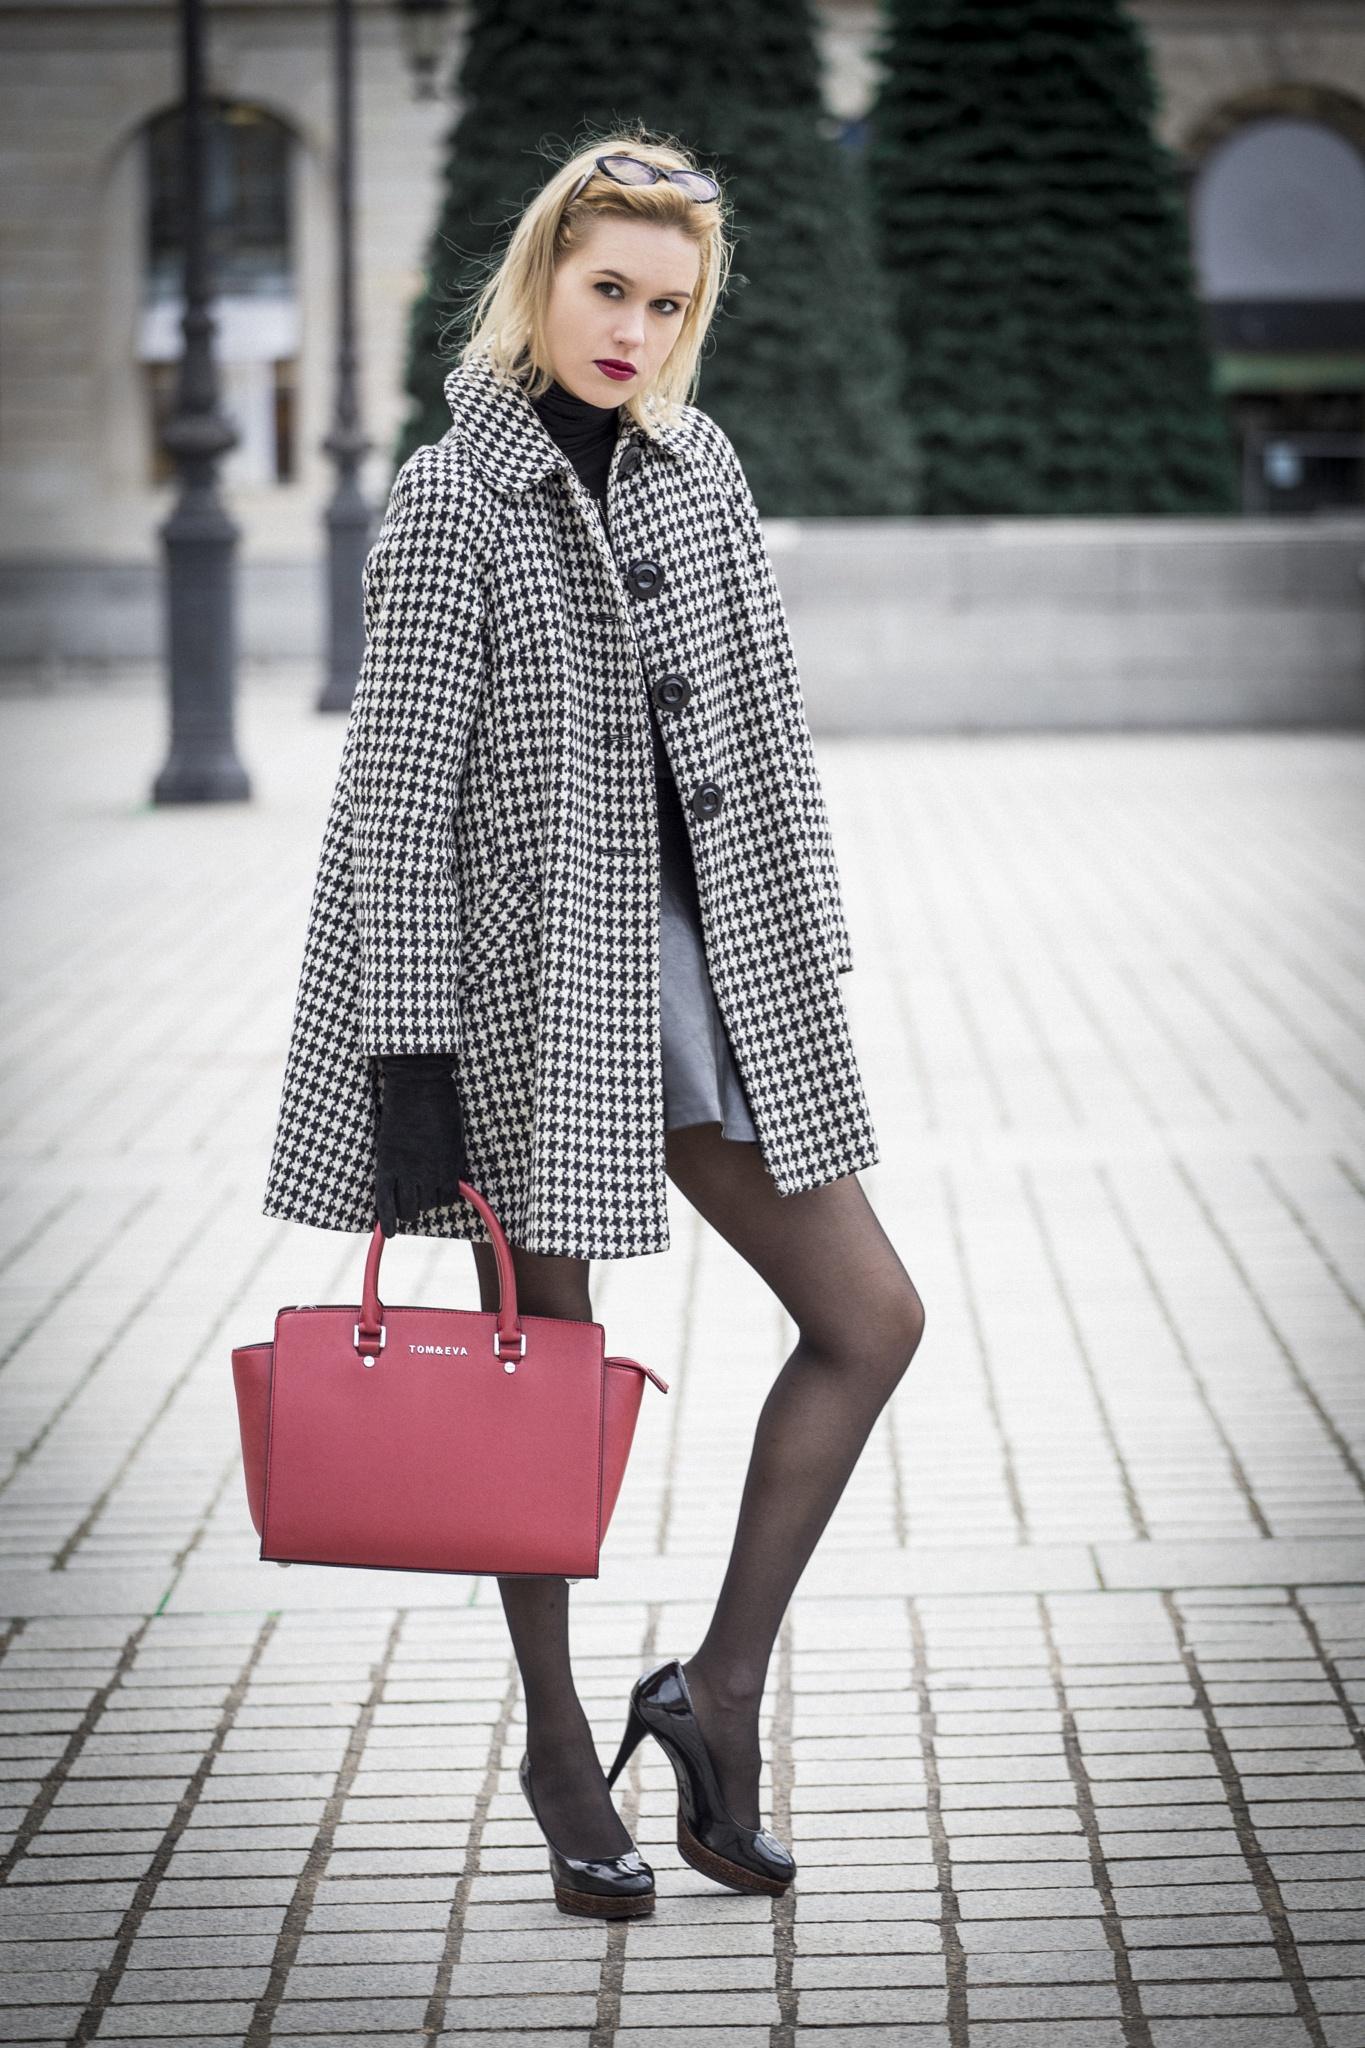 Fashion in Paris  by paulinecheyrouze3